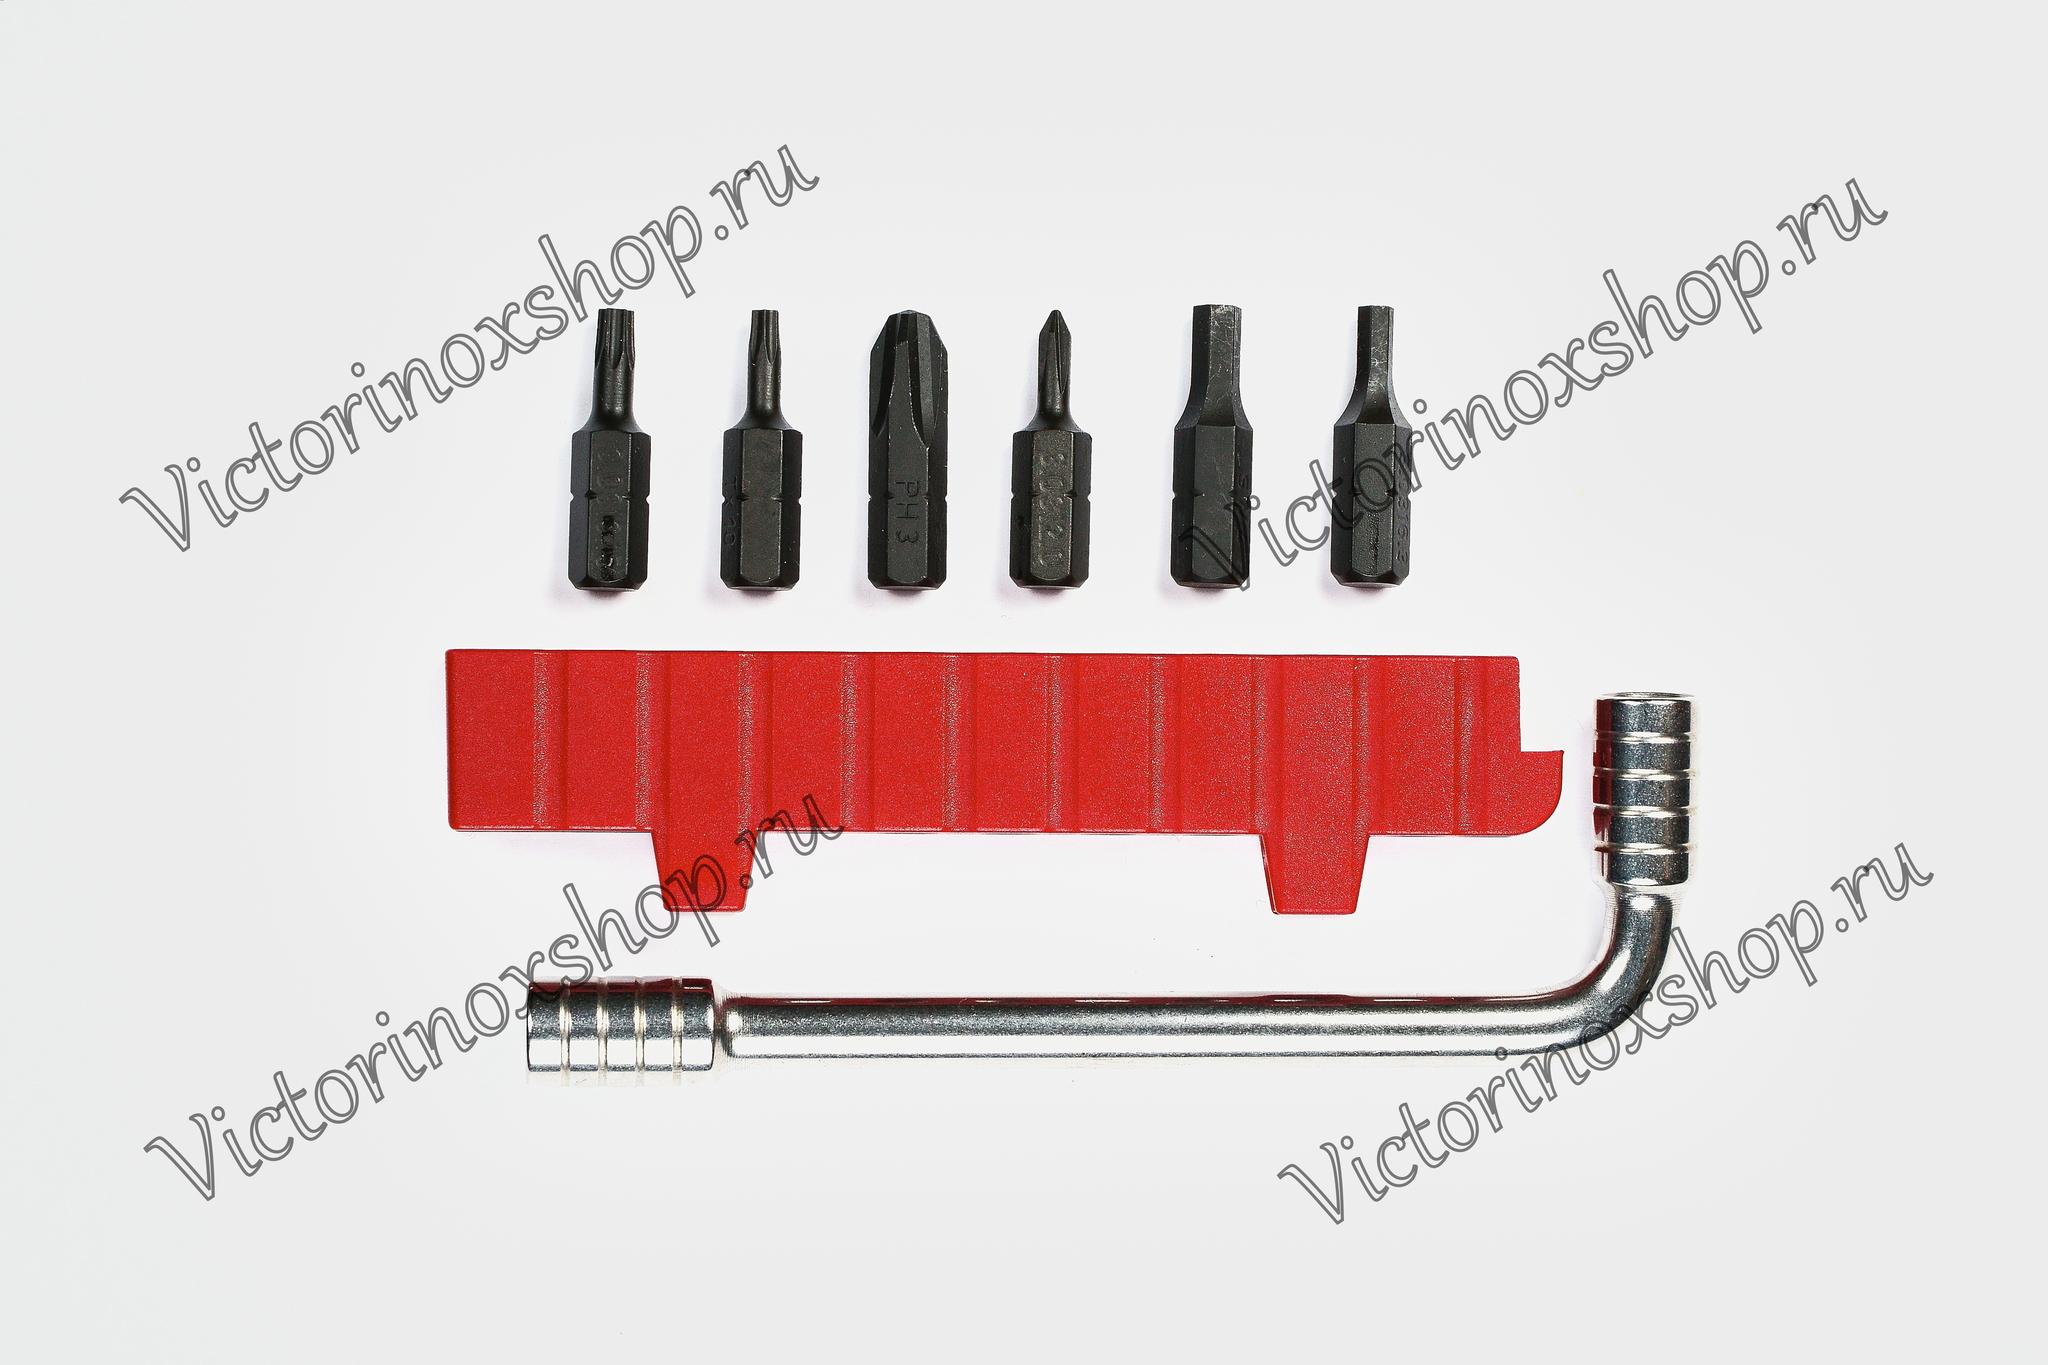 Монтажный ключ с набором бит для SwissTool Victorinox (3.0303)